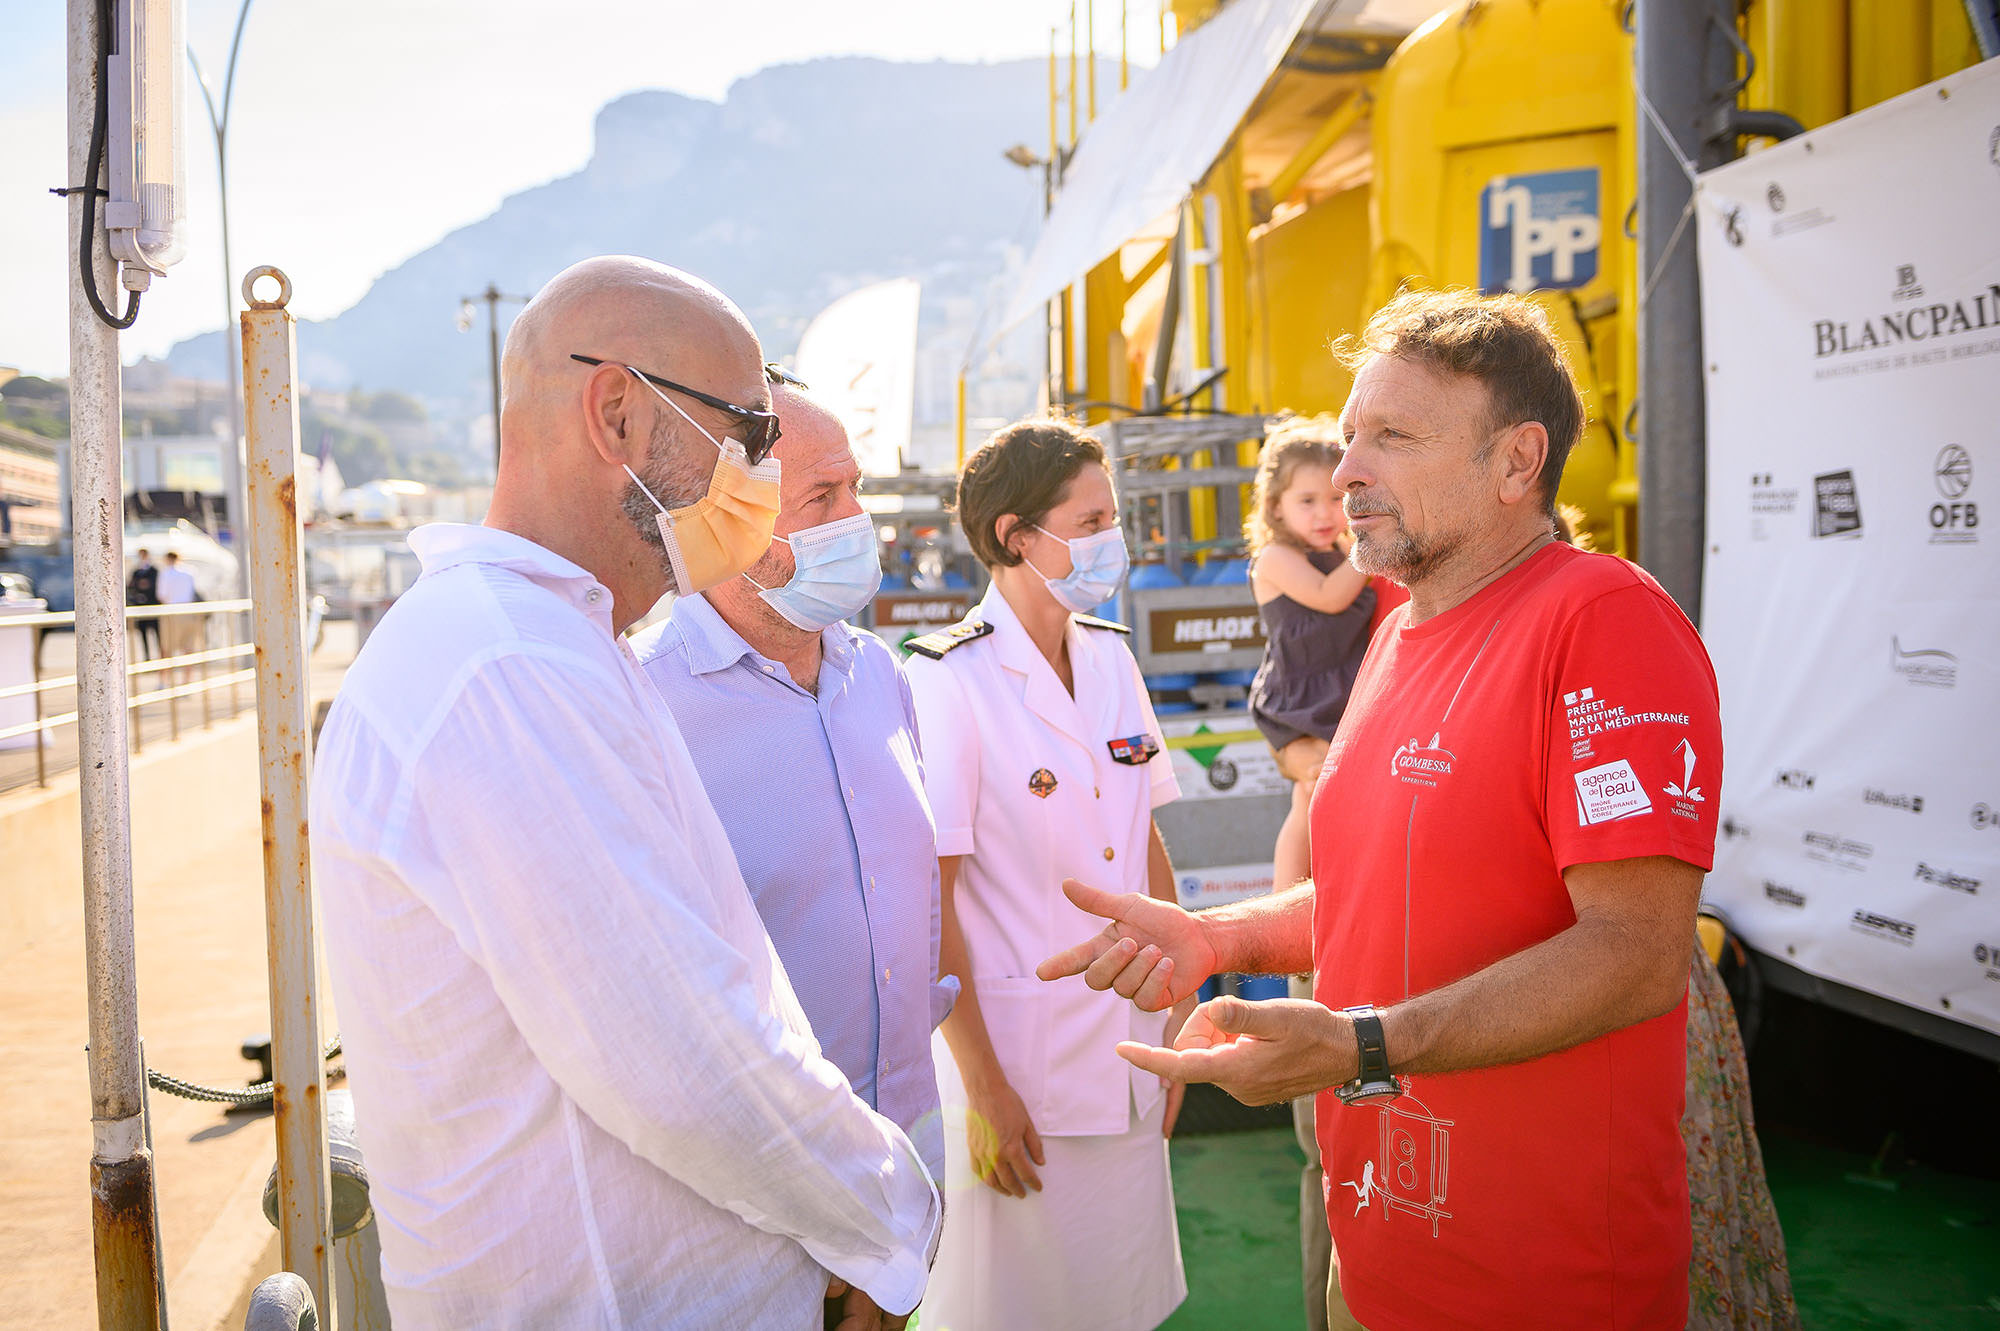 Marc A. Hayek (President & CEO of Blancpain) & Andrea Caputo (VP Head of Marketing) Roberto Rinaldi Gombessa VI